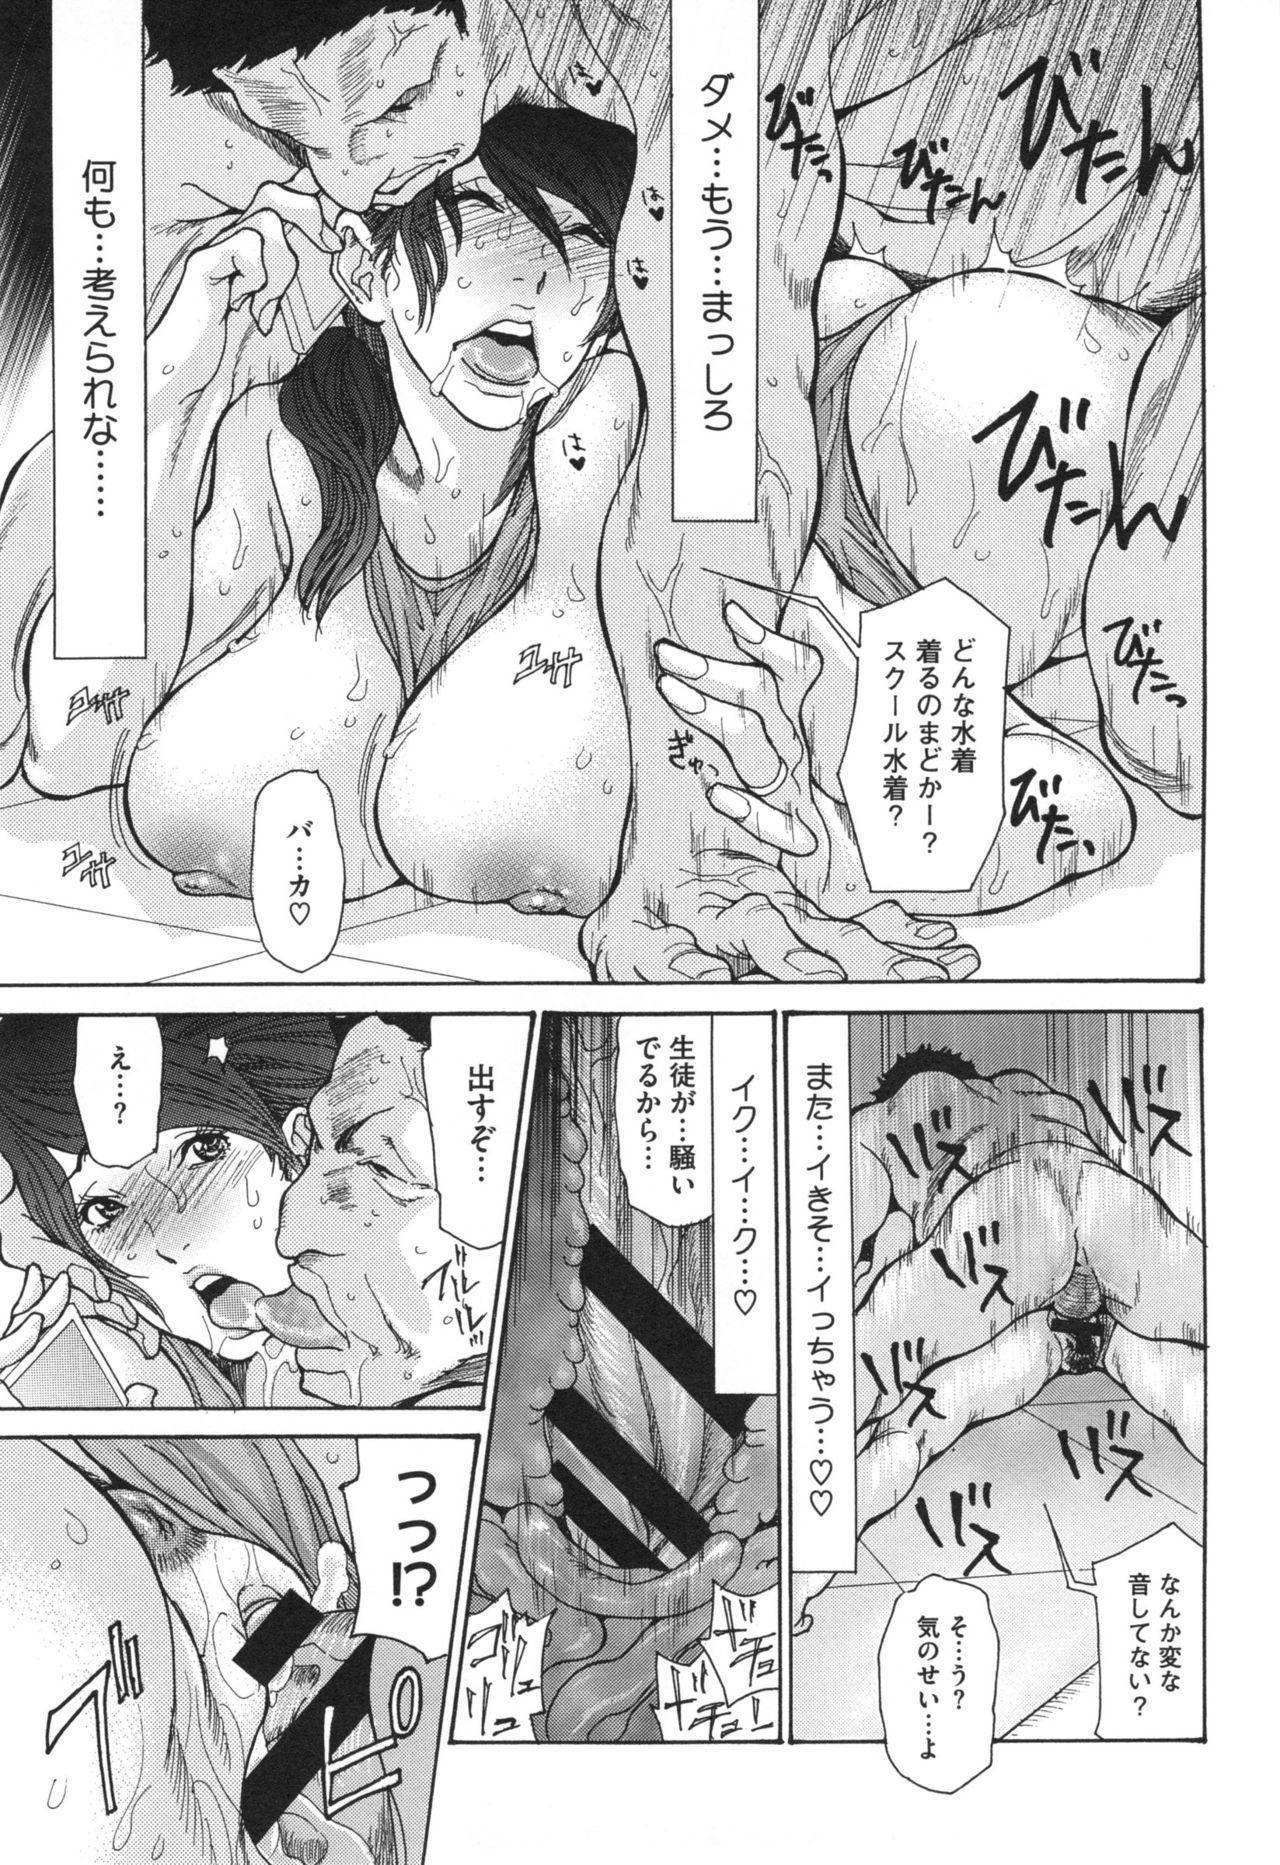 Niku-zuma Netorare Maniacs 65